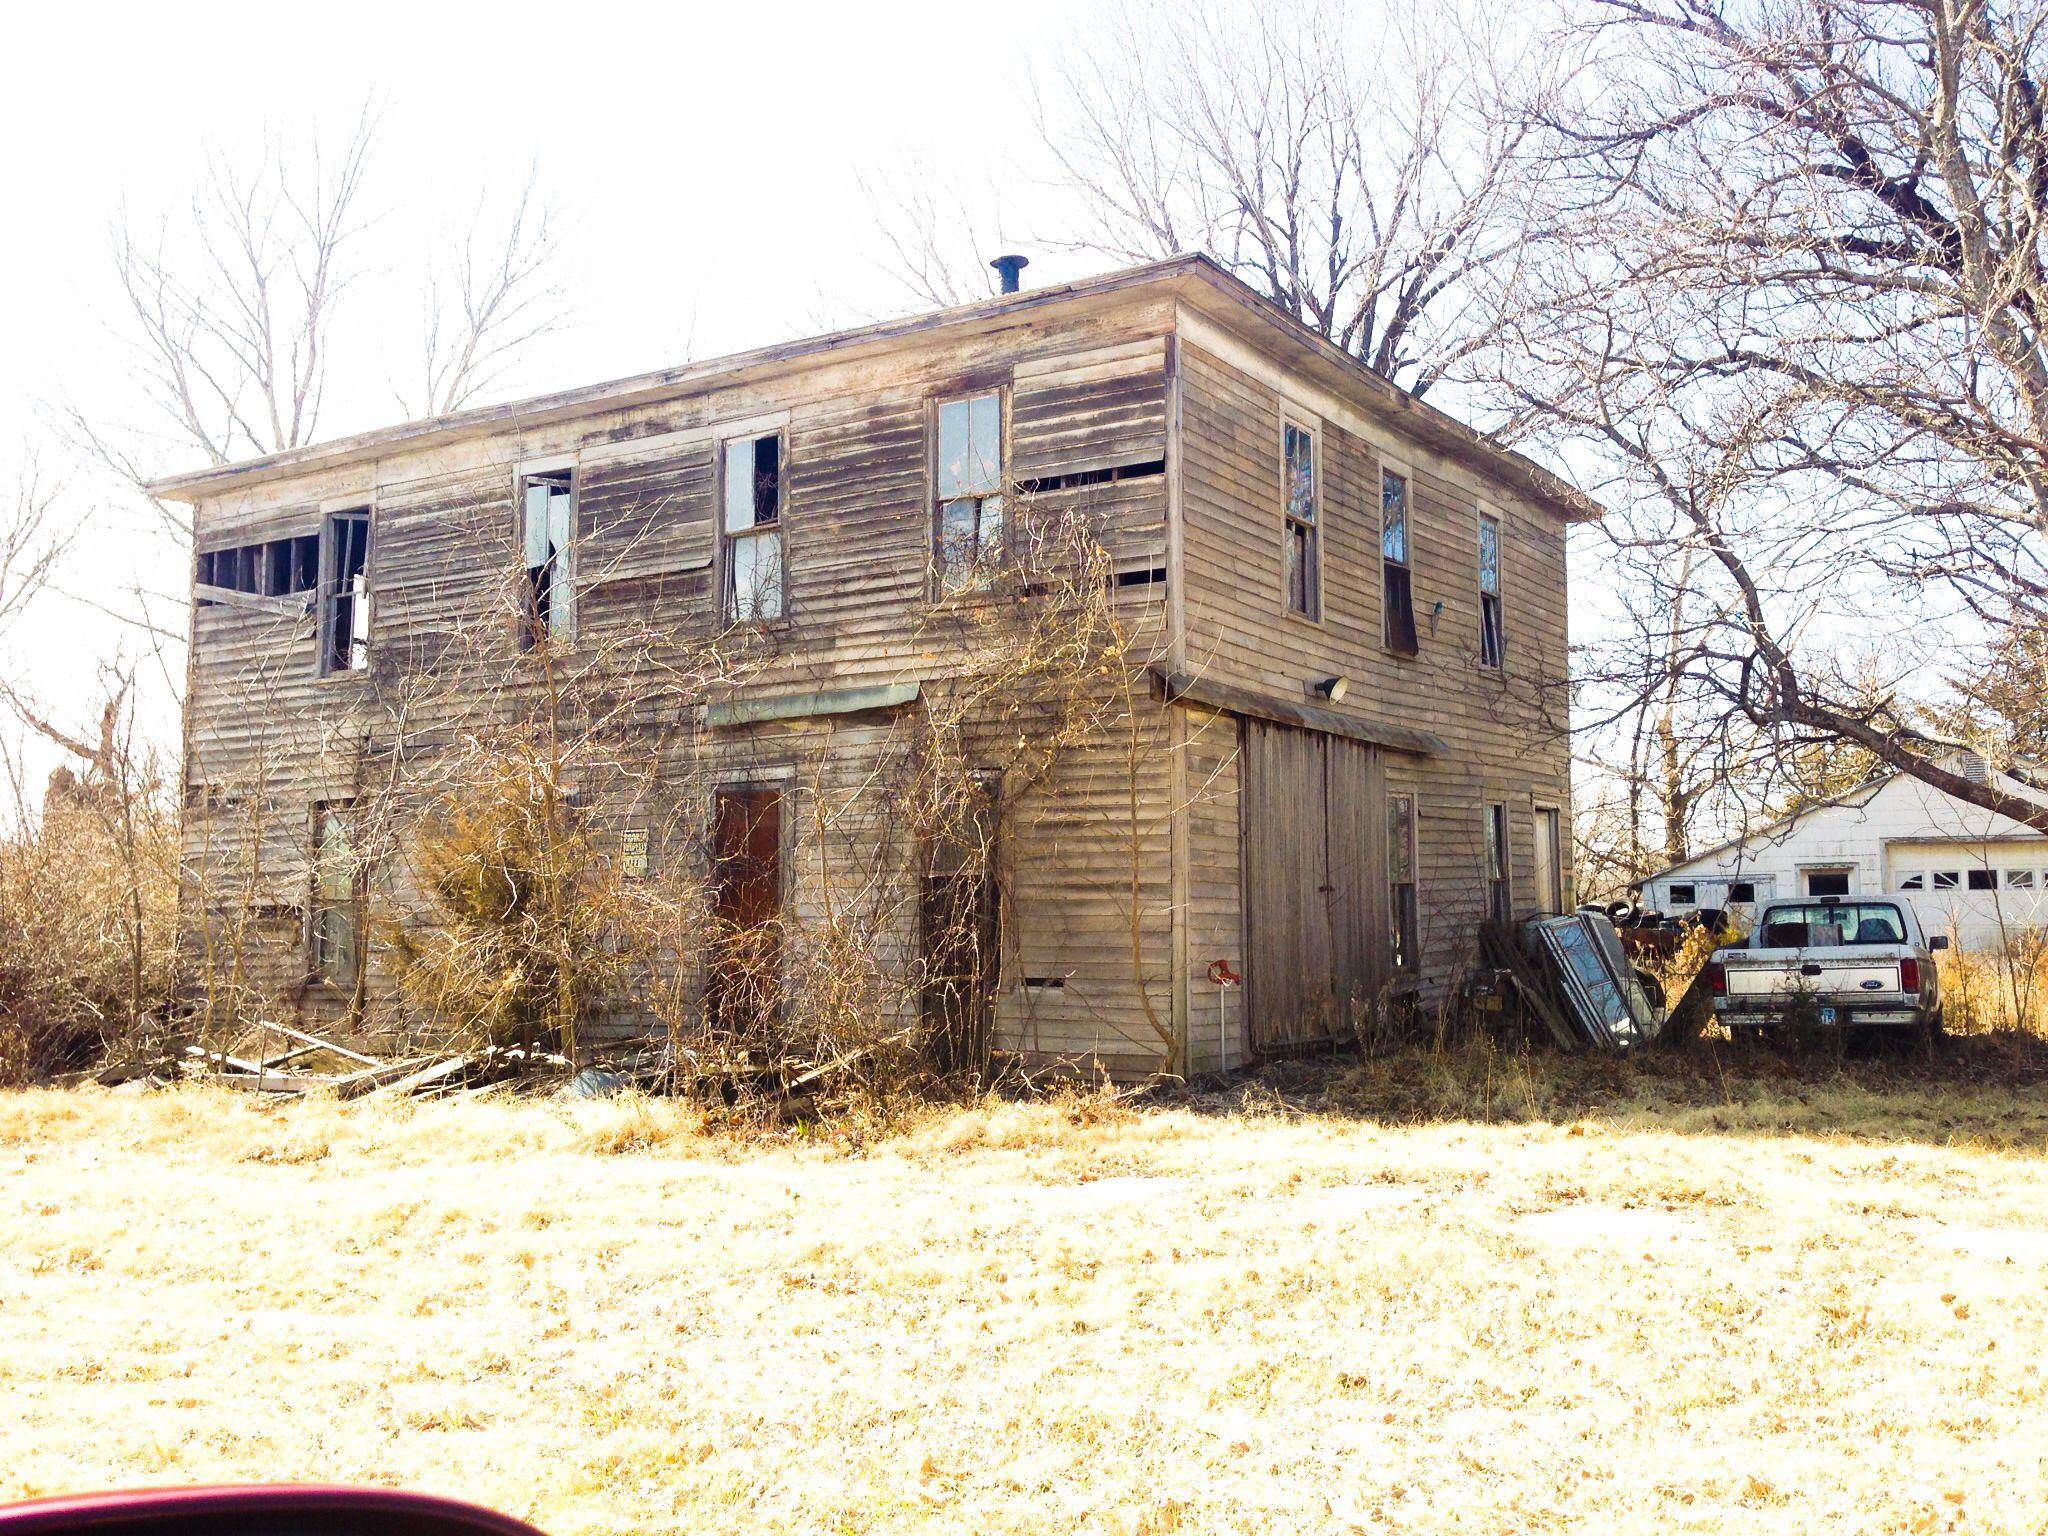 Kansas stanton county manter - Neal Ks A Ghost Town